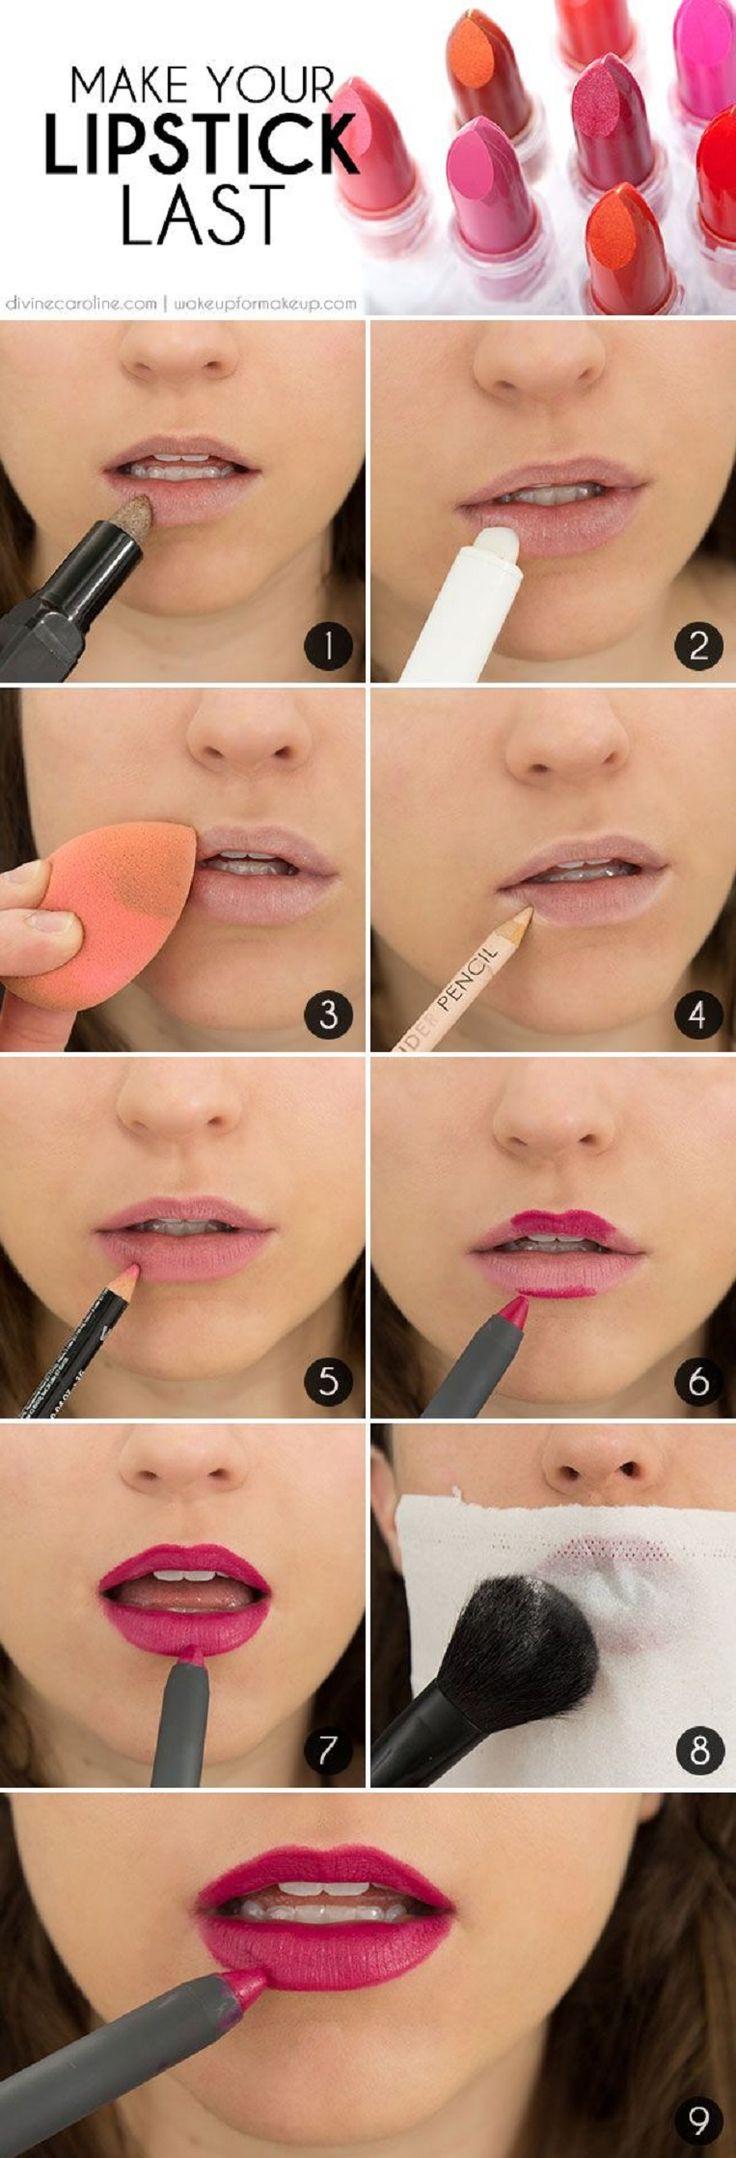 Long-Lasting Purple Lipstick Tutorial - 15 Best Beauty Tutorials for Winter 2014-2015 | GleamItUp⚜BuffyVS⚜